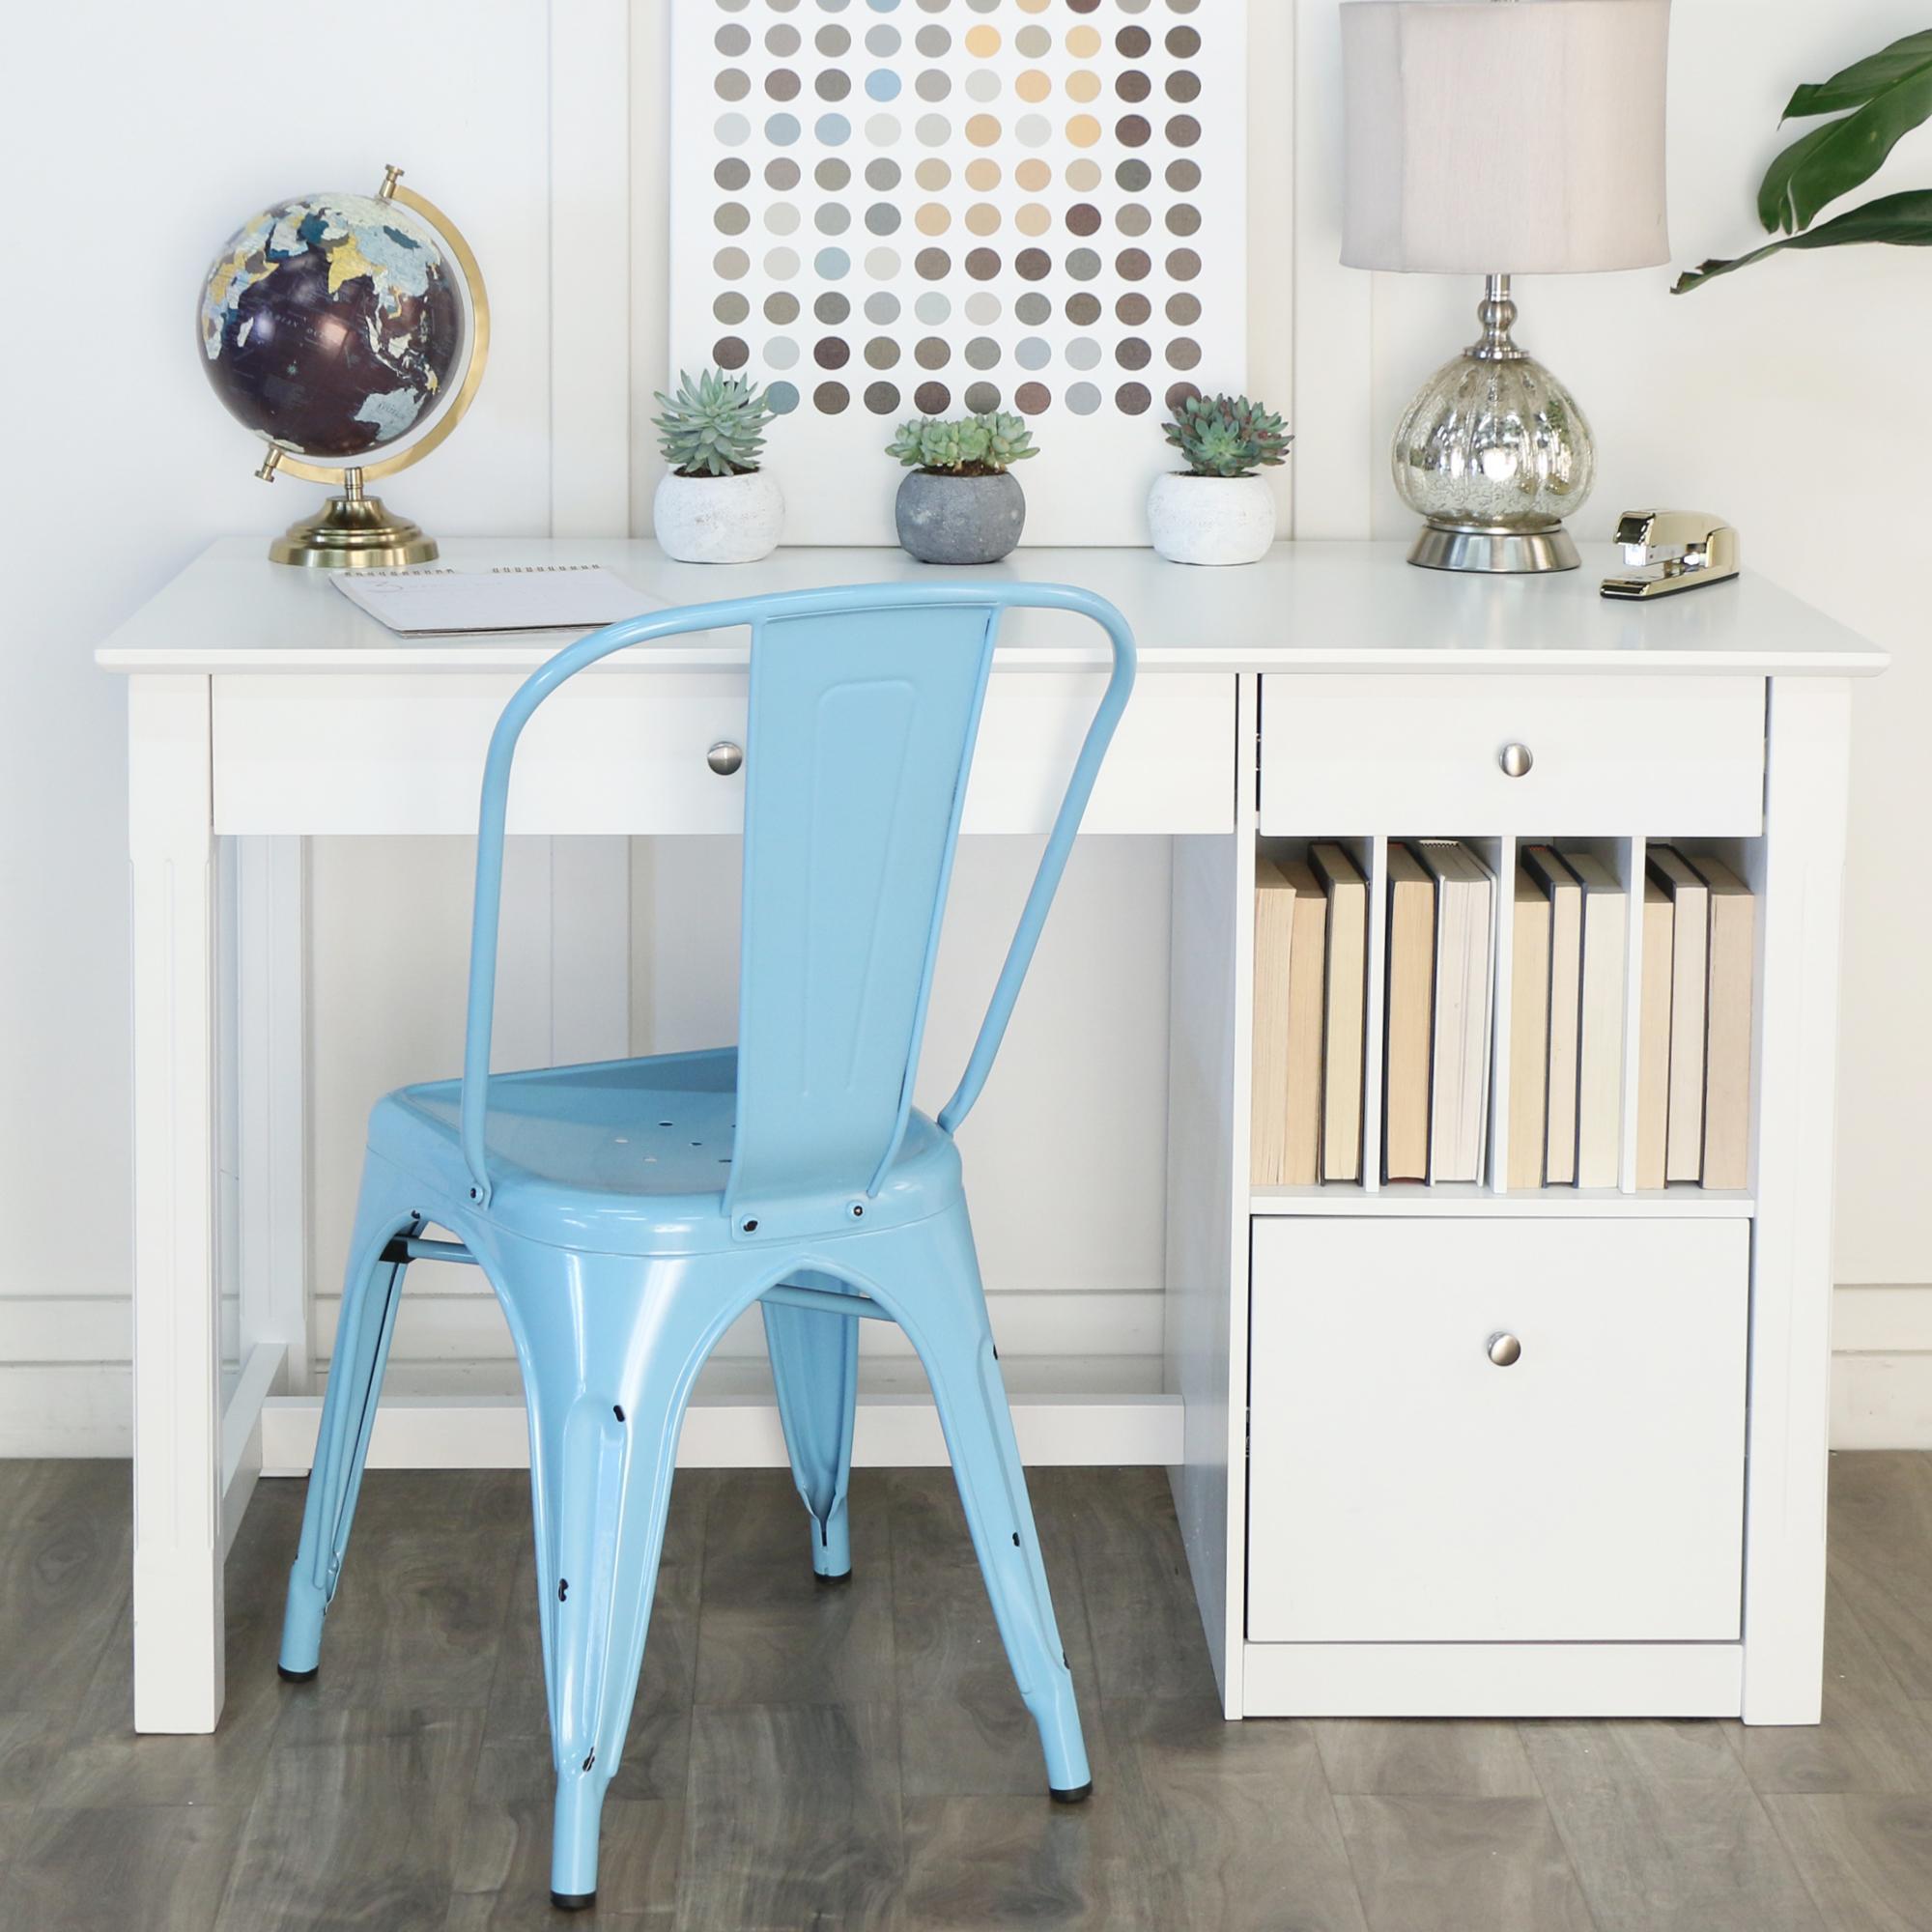 Amazon.com: White Wood Deluxe Storage Computer Desk: Kitchen & Dining